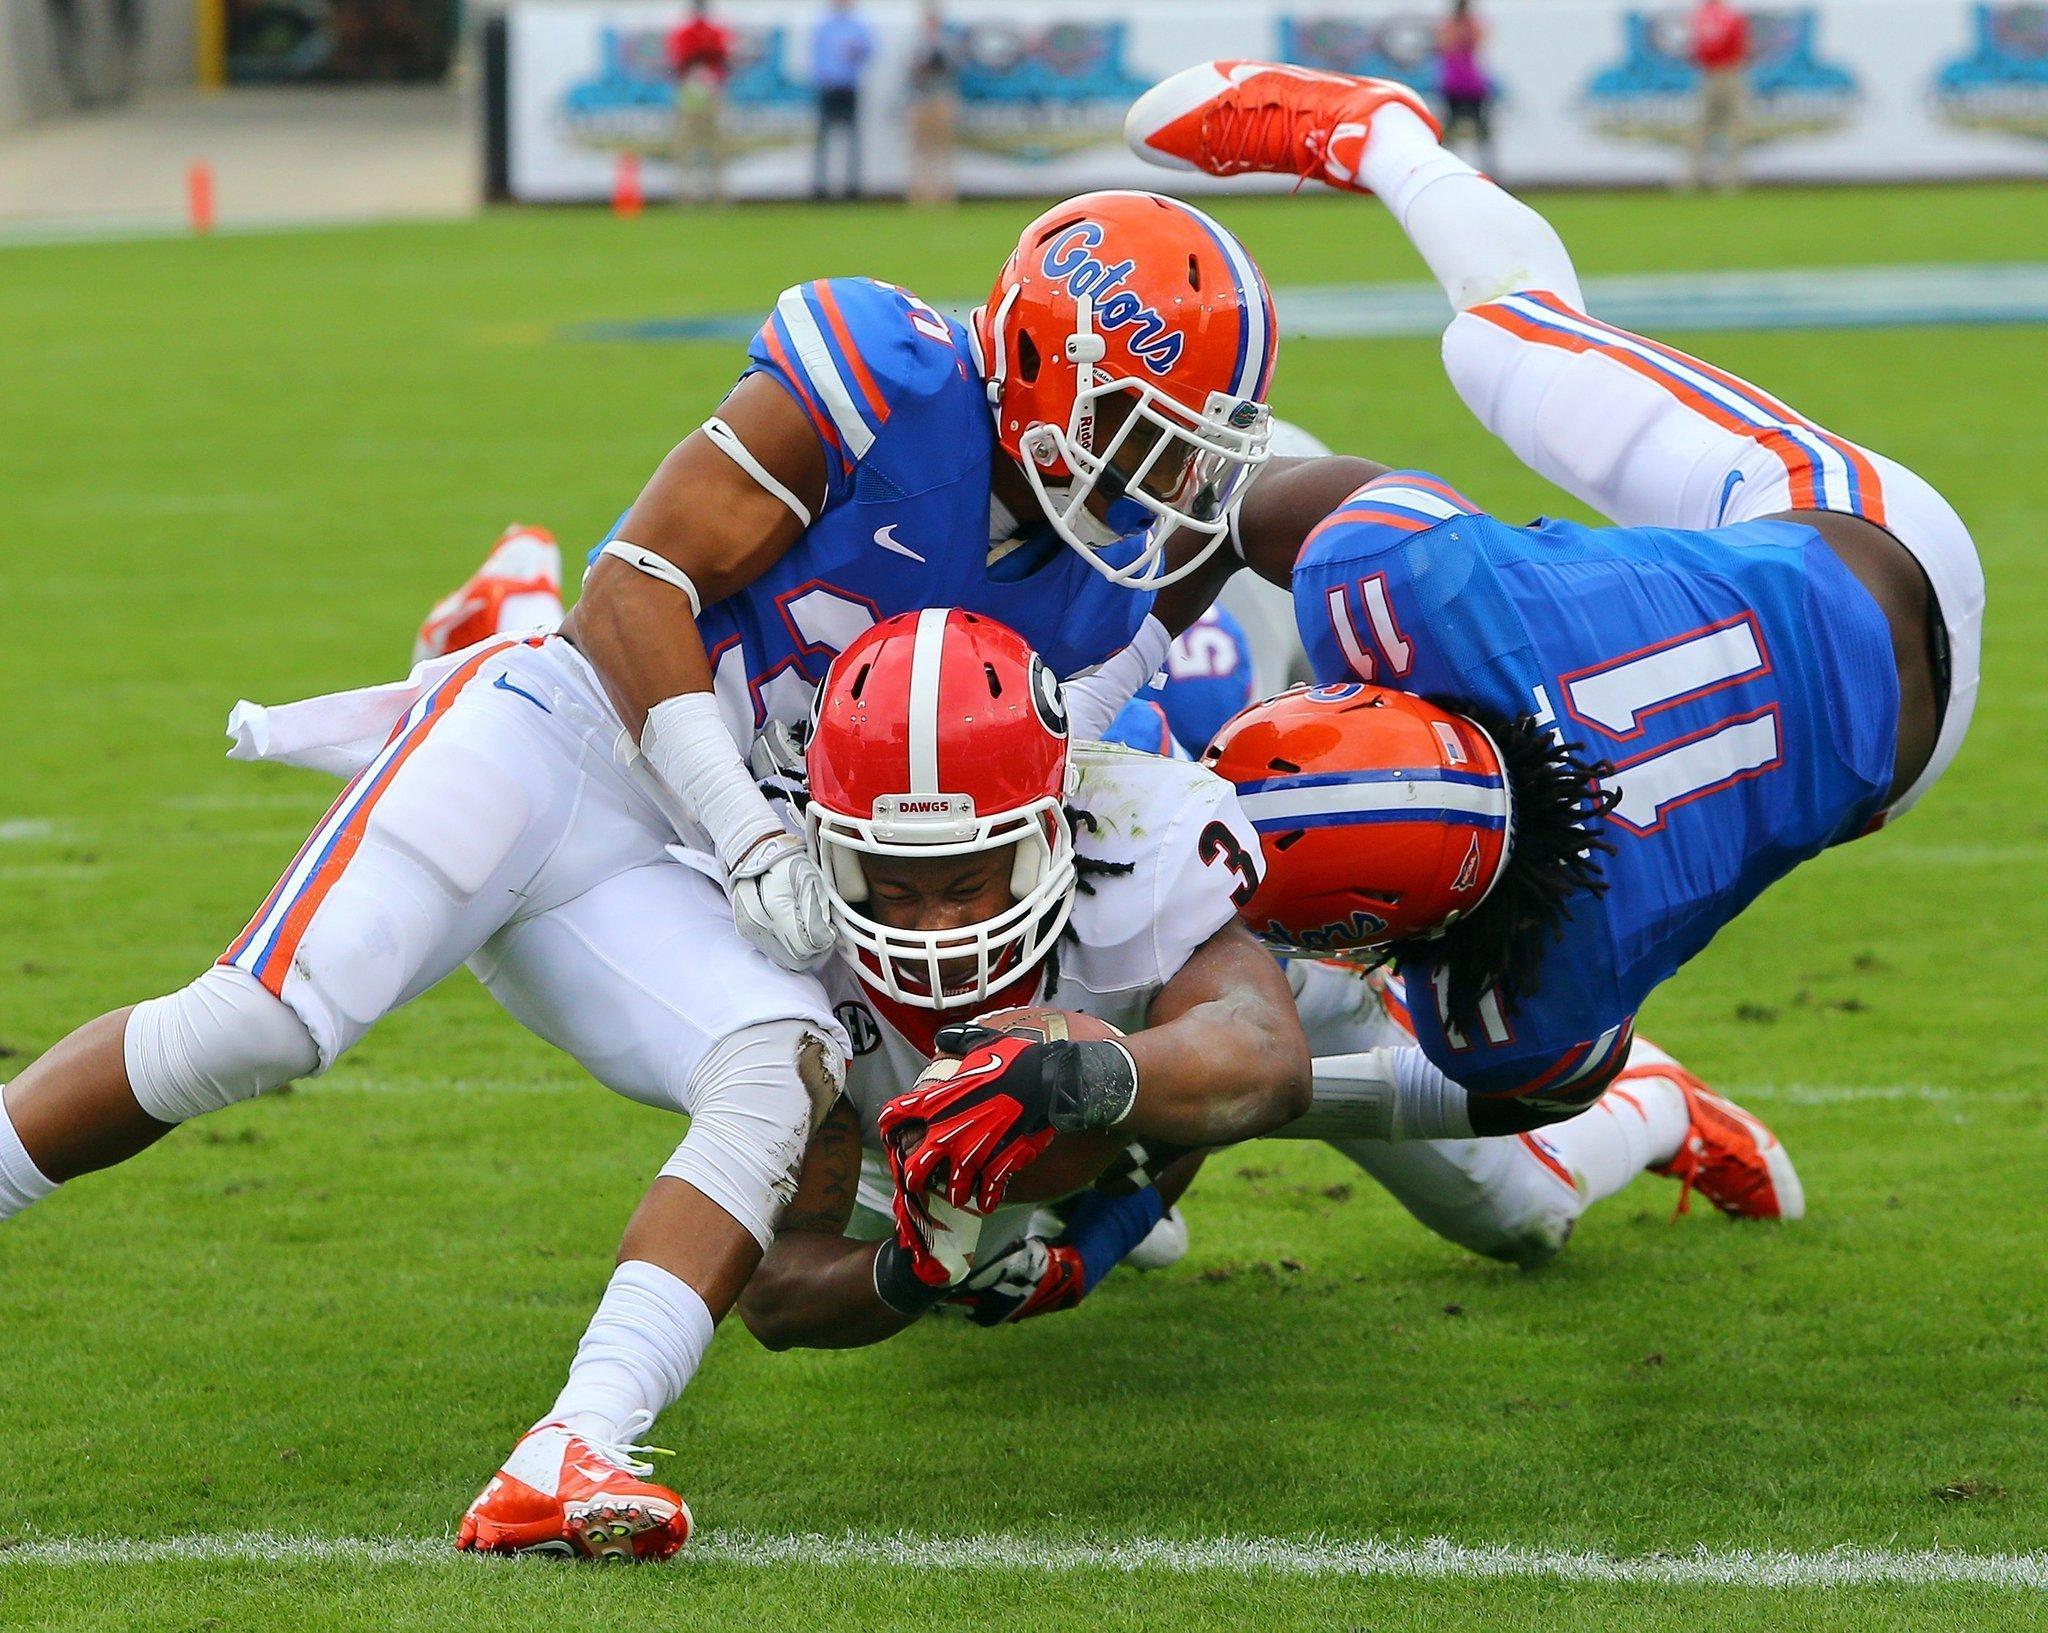 Bring on Todd Gurley Gators say Orlando Sentinel